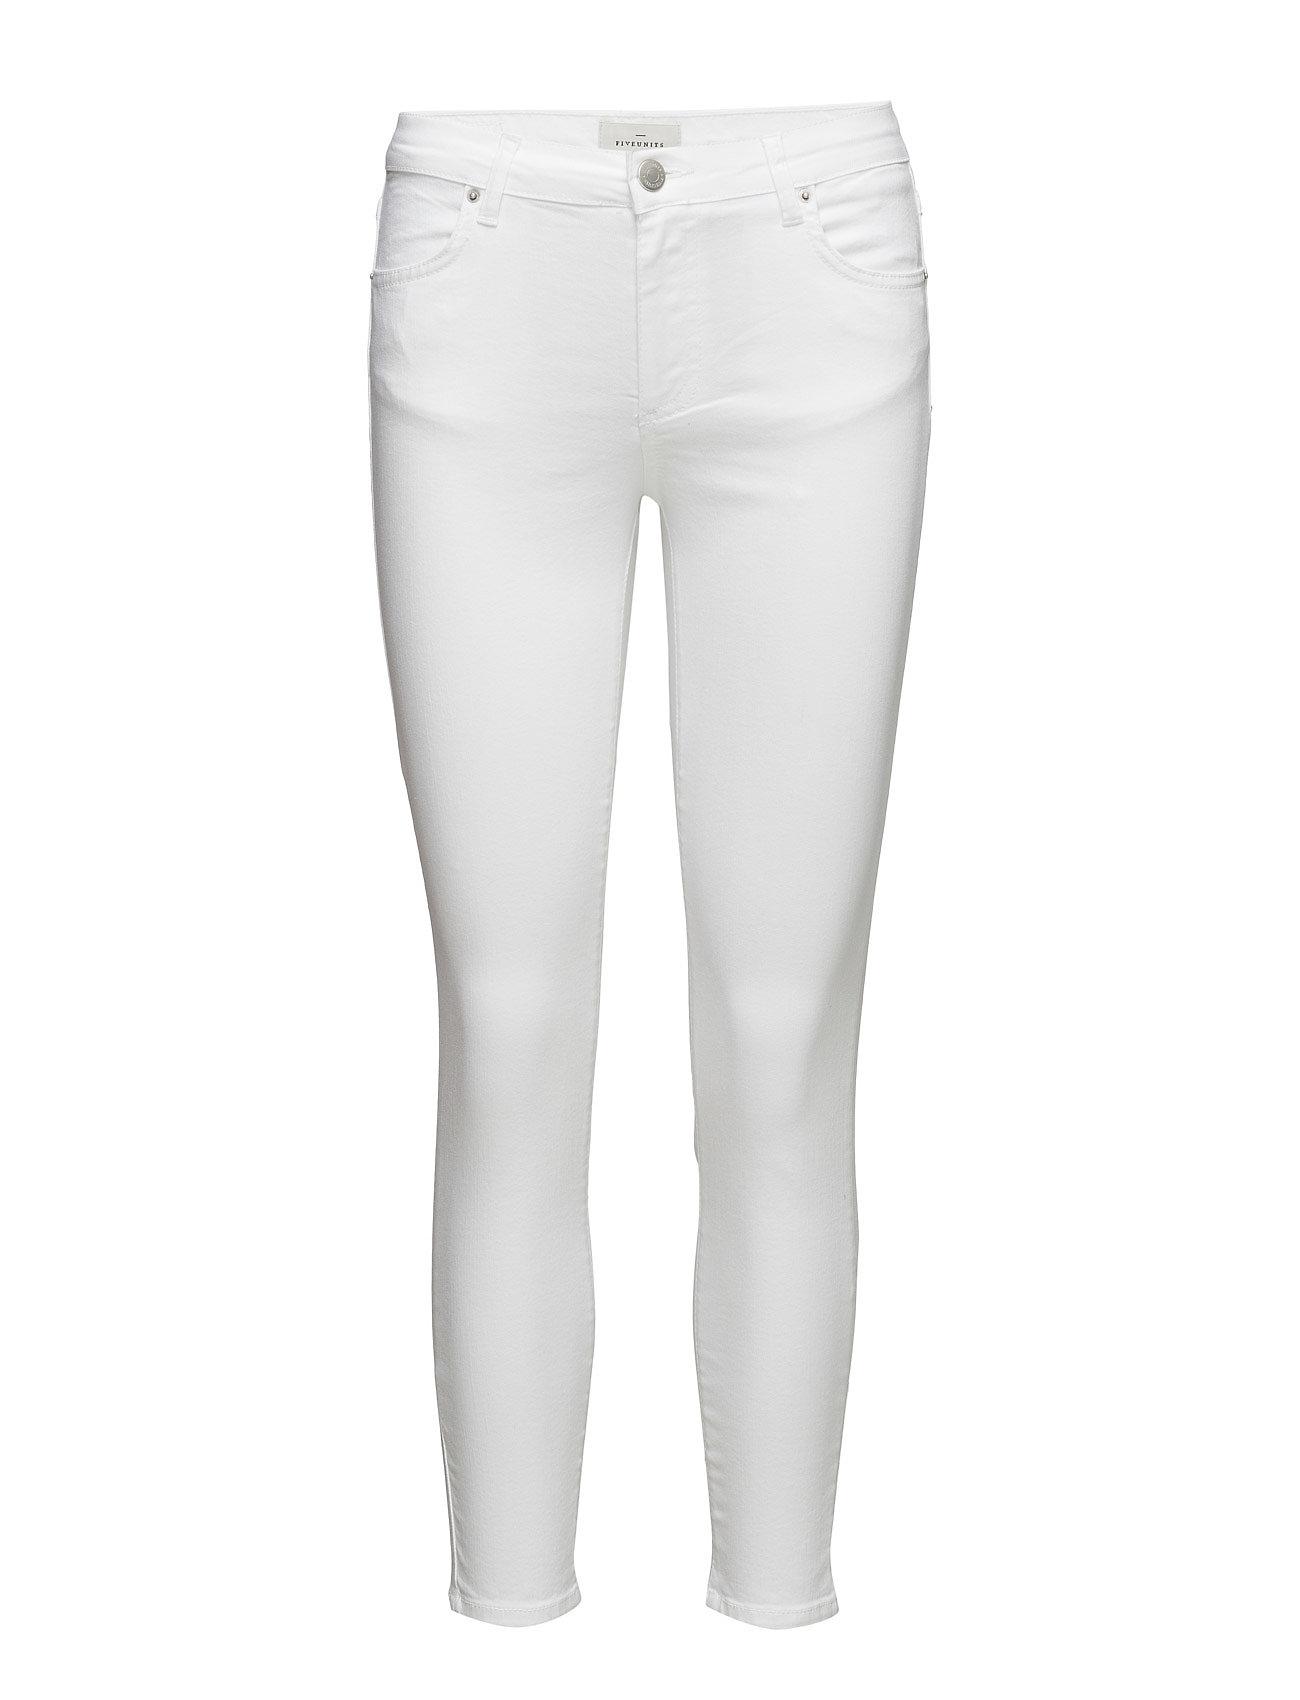 Penelope 155 Split, White, Jeans FIVEUNITS Skinny